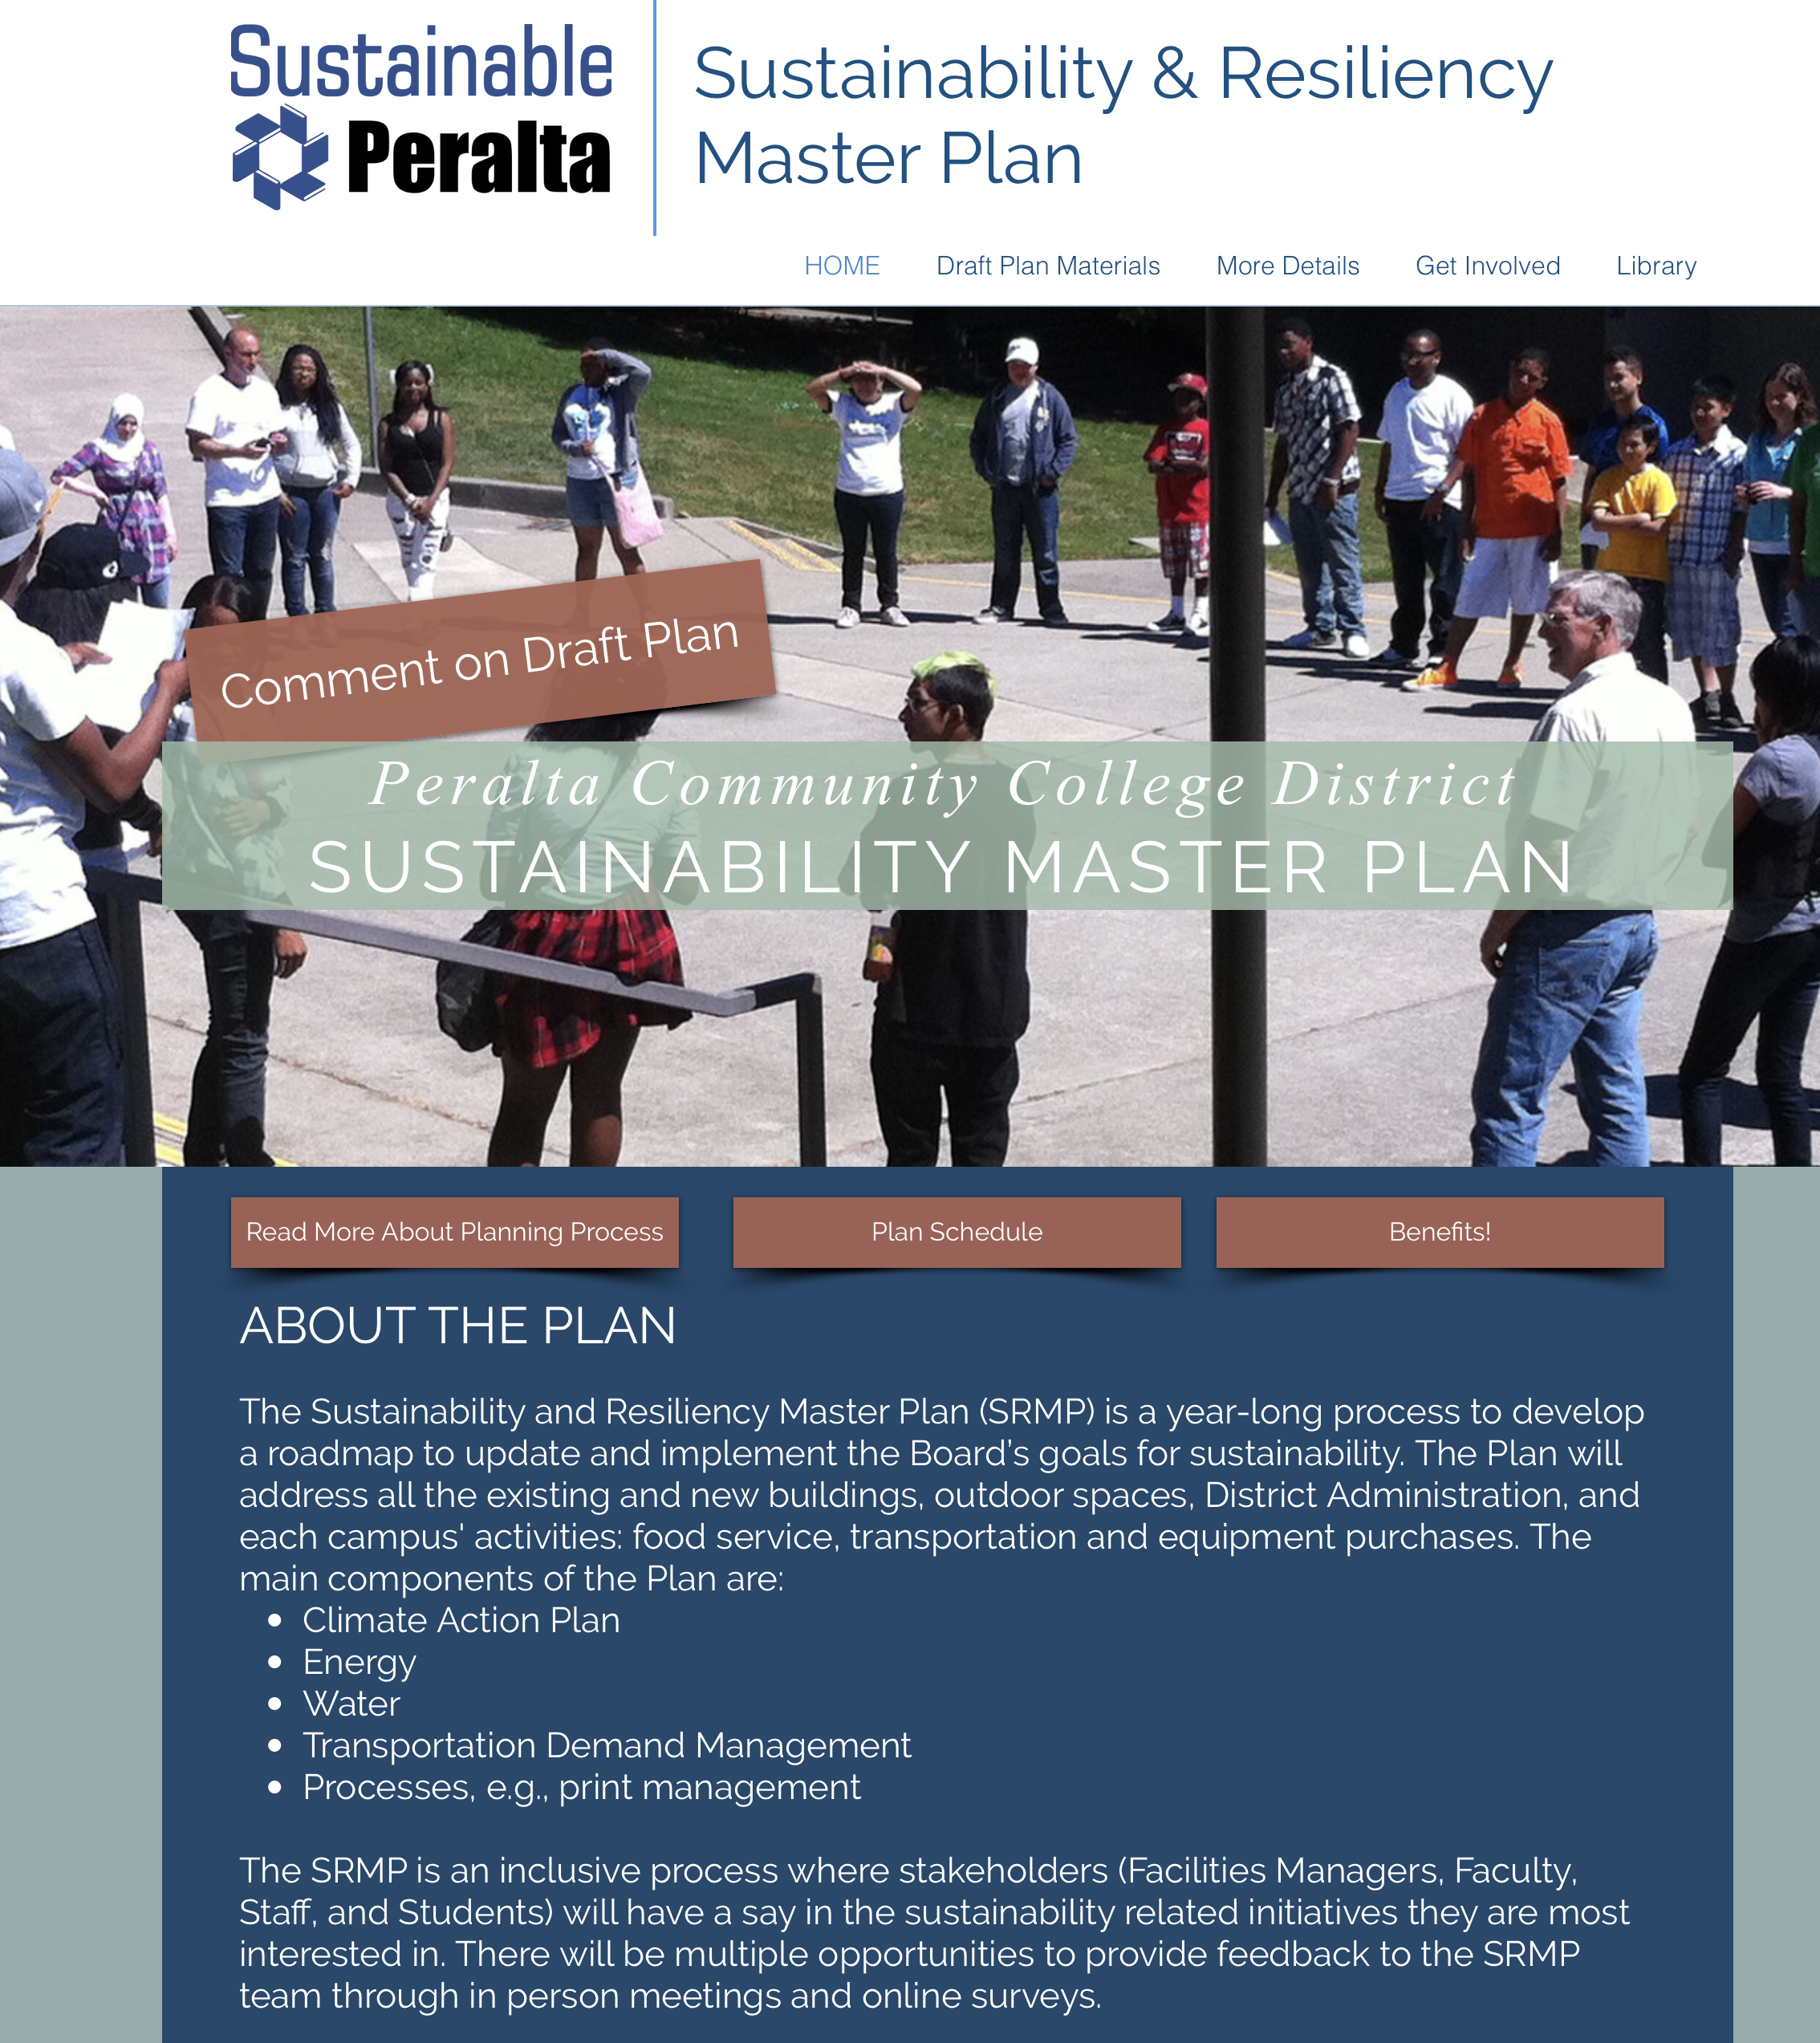 Peralta Sustainability Plan Website